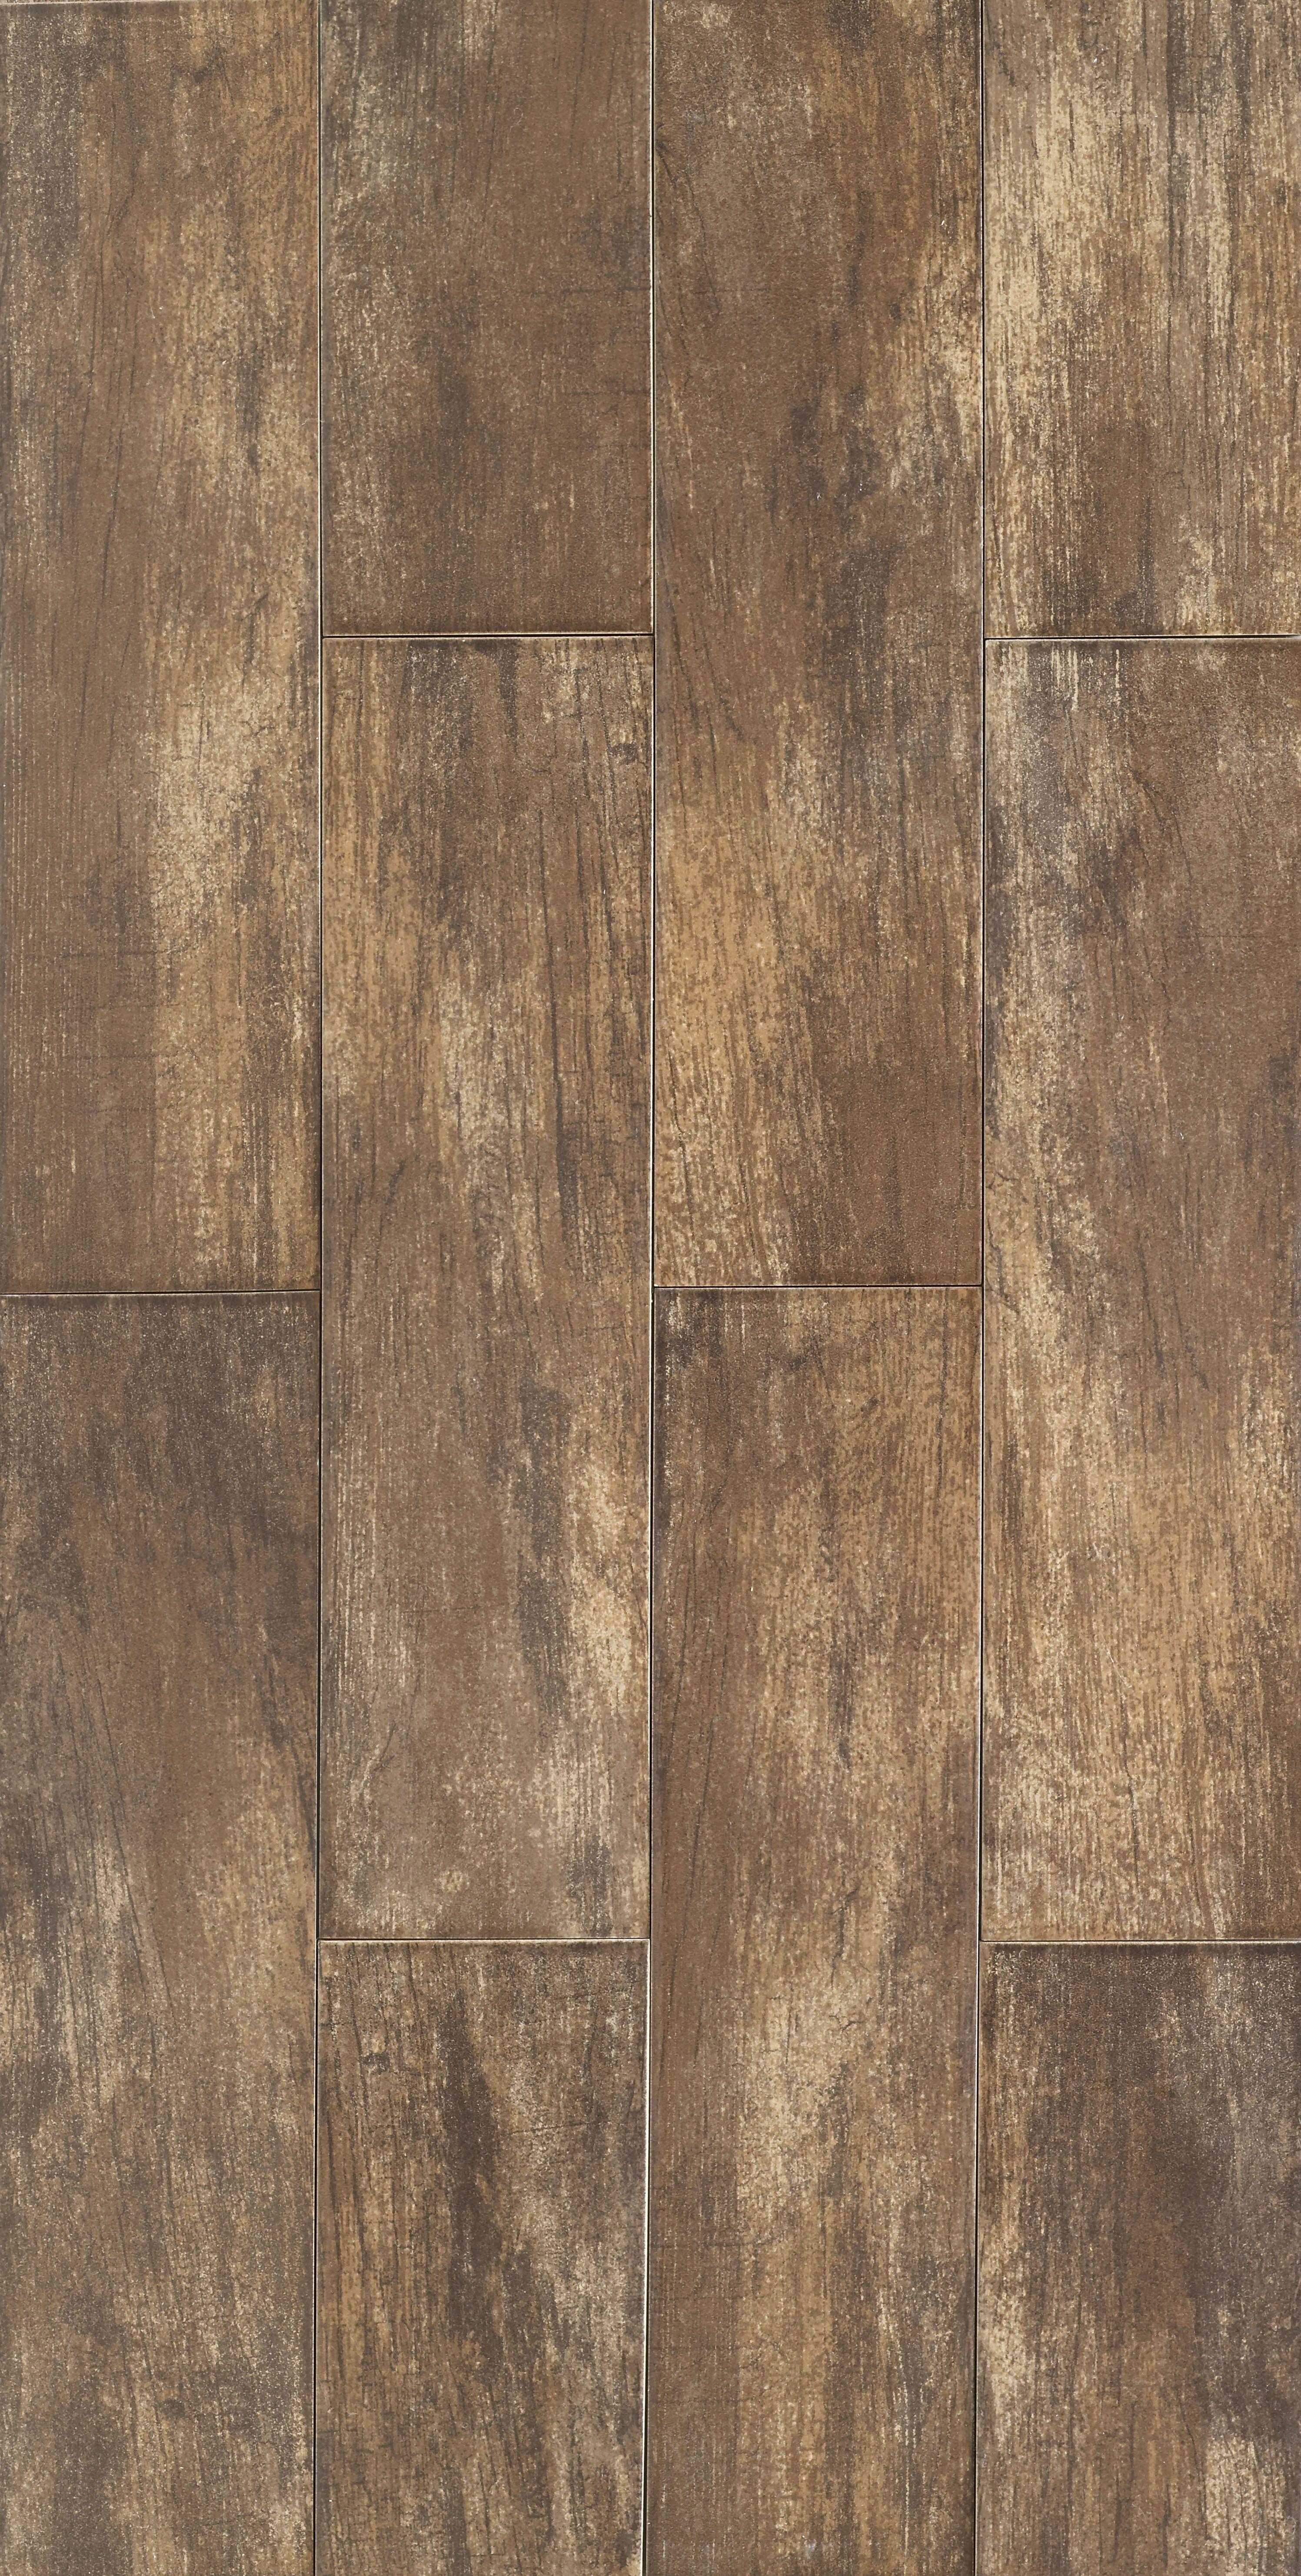 Interceramic Forestland Cypress 6x24 Wood Look